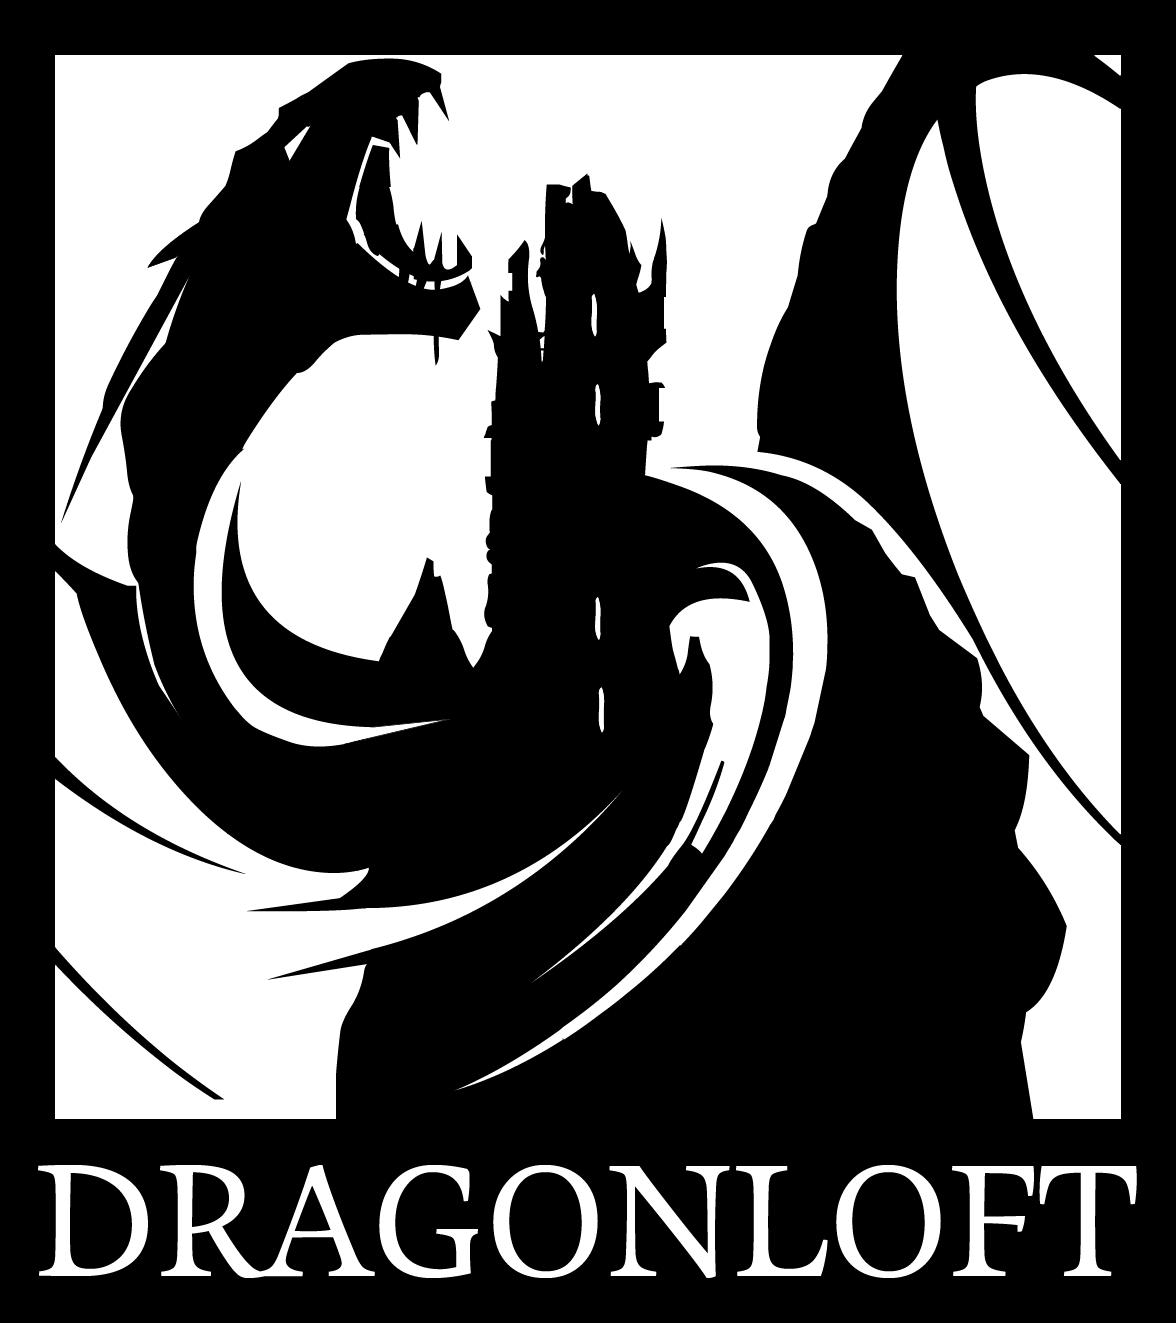 The Dragonloft